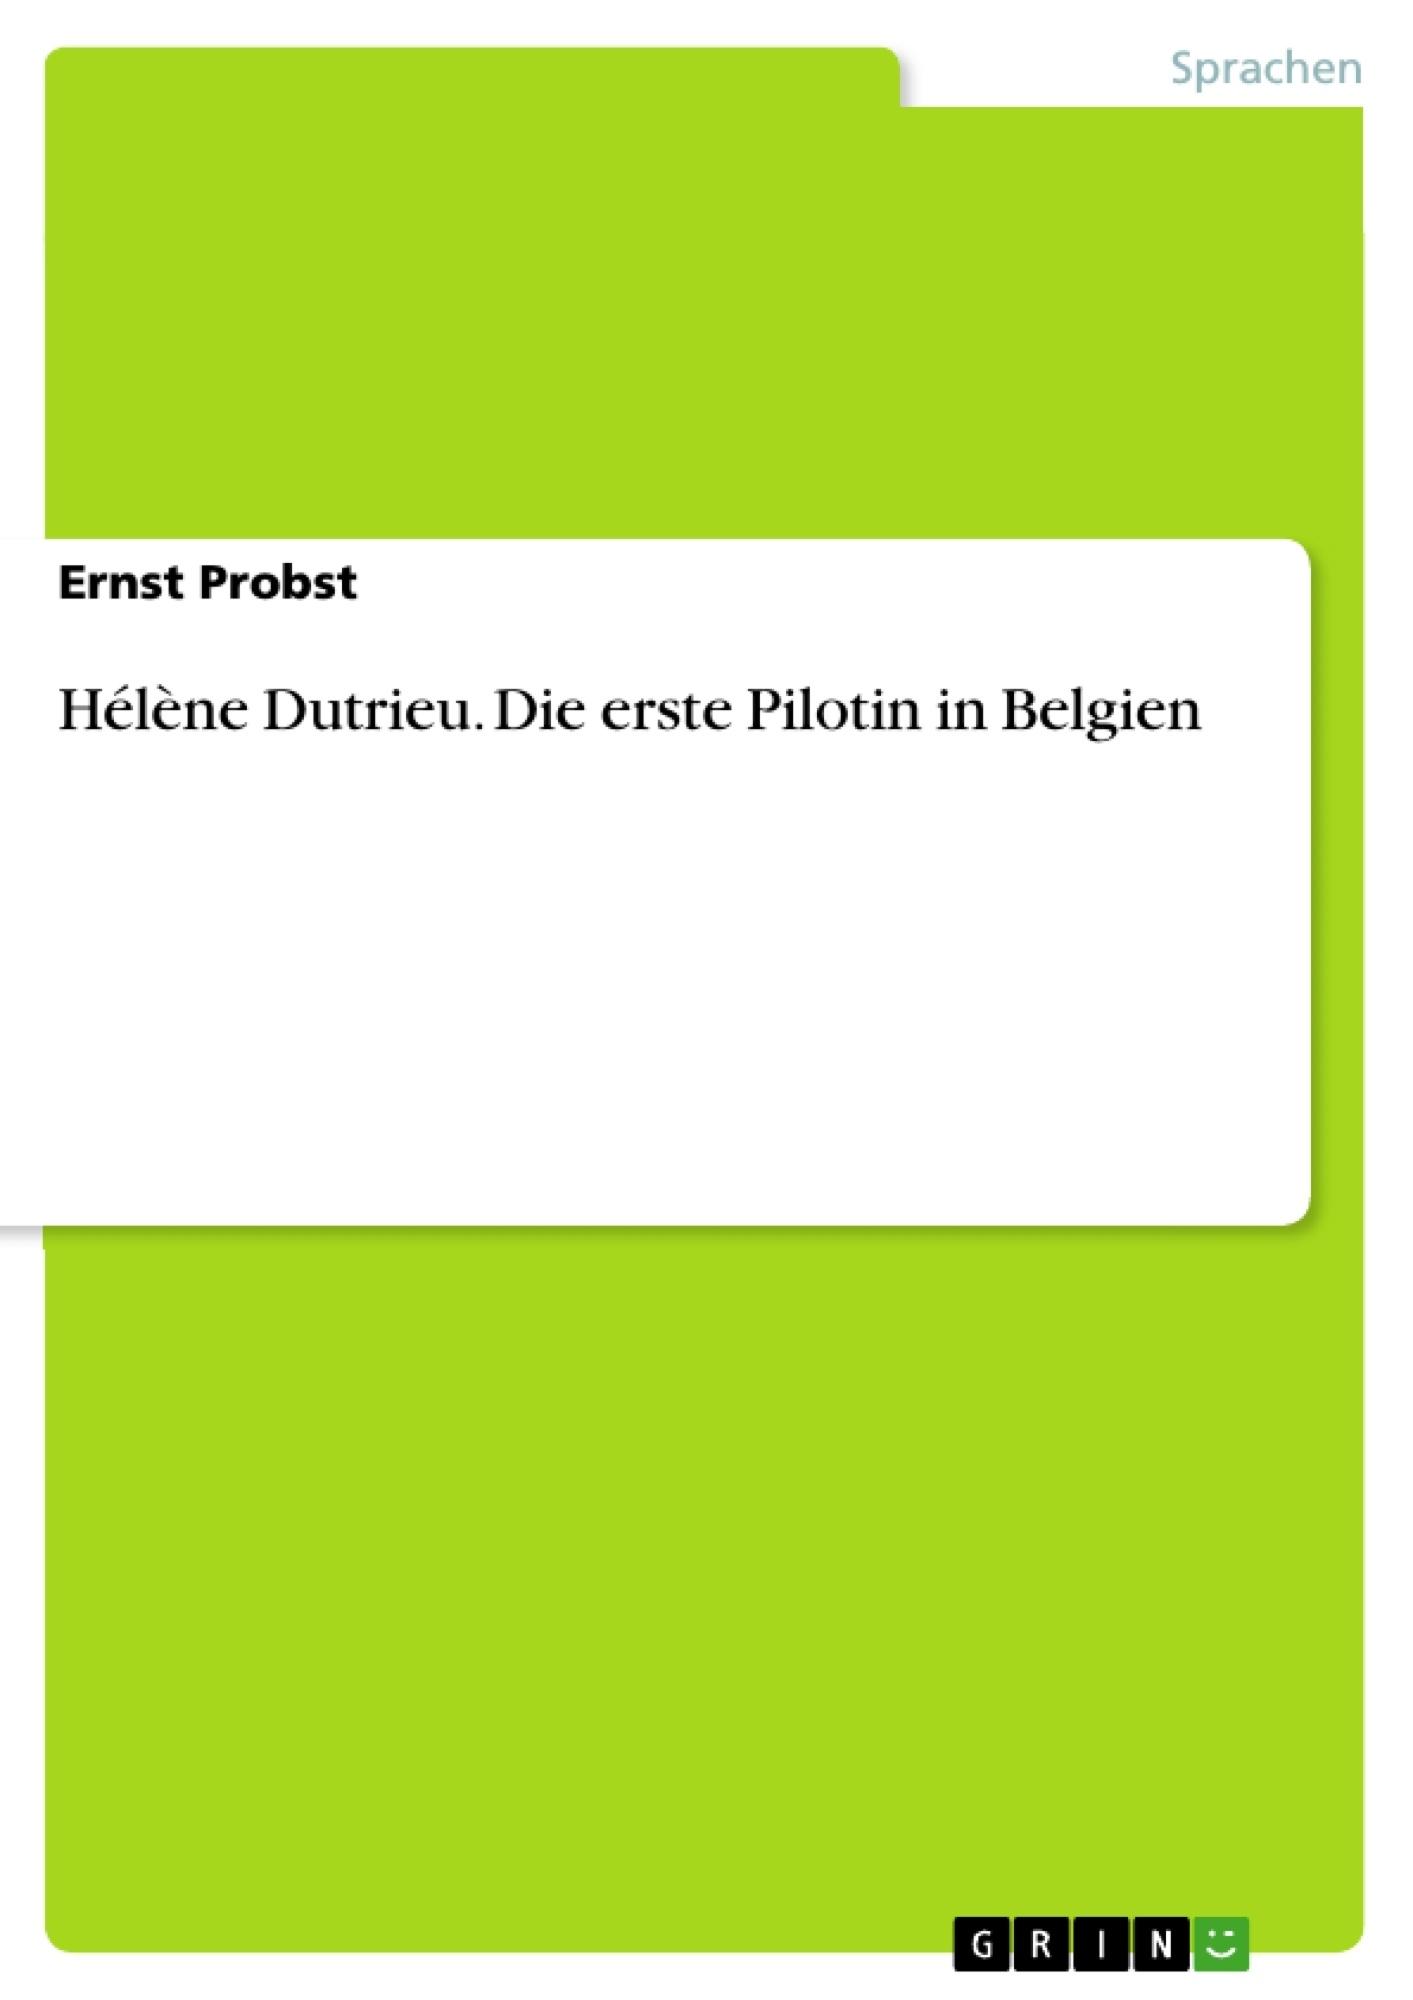 Titel: Hélène Dutrieu. Die erste Pilotin in Belgien